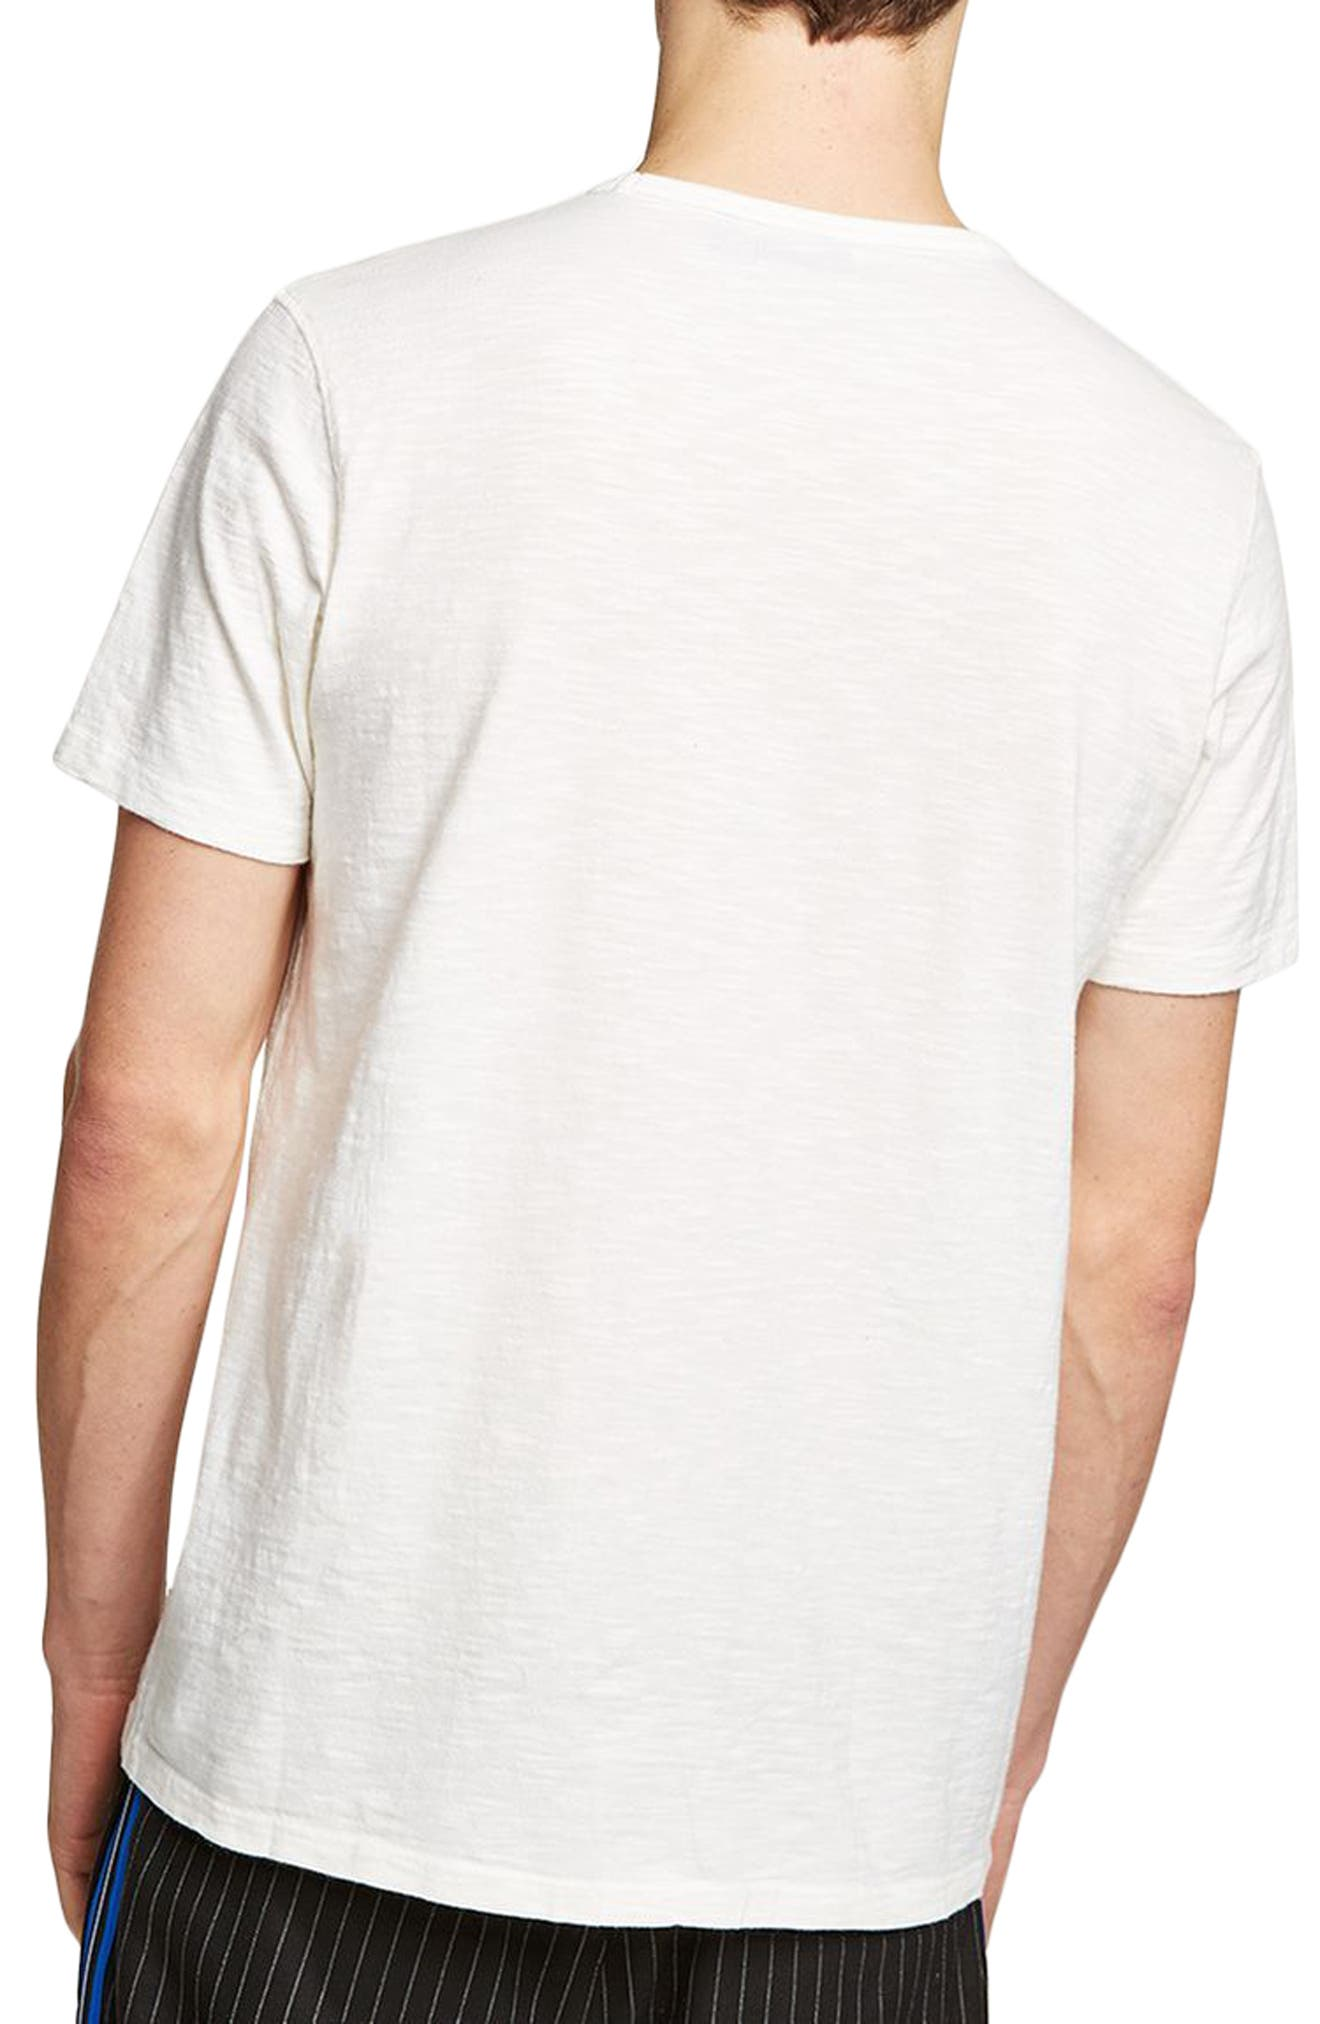 Liberté Graphic T-Shirt,                             Alternate thumbnail 2, color,                             White Multi